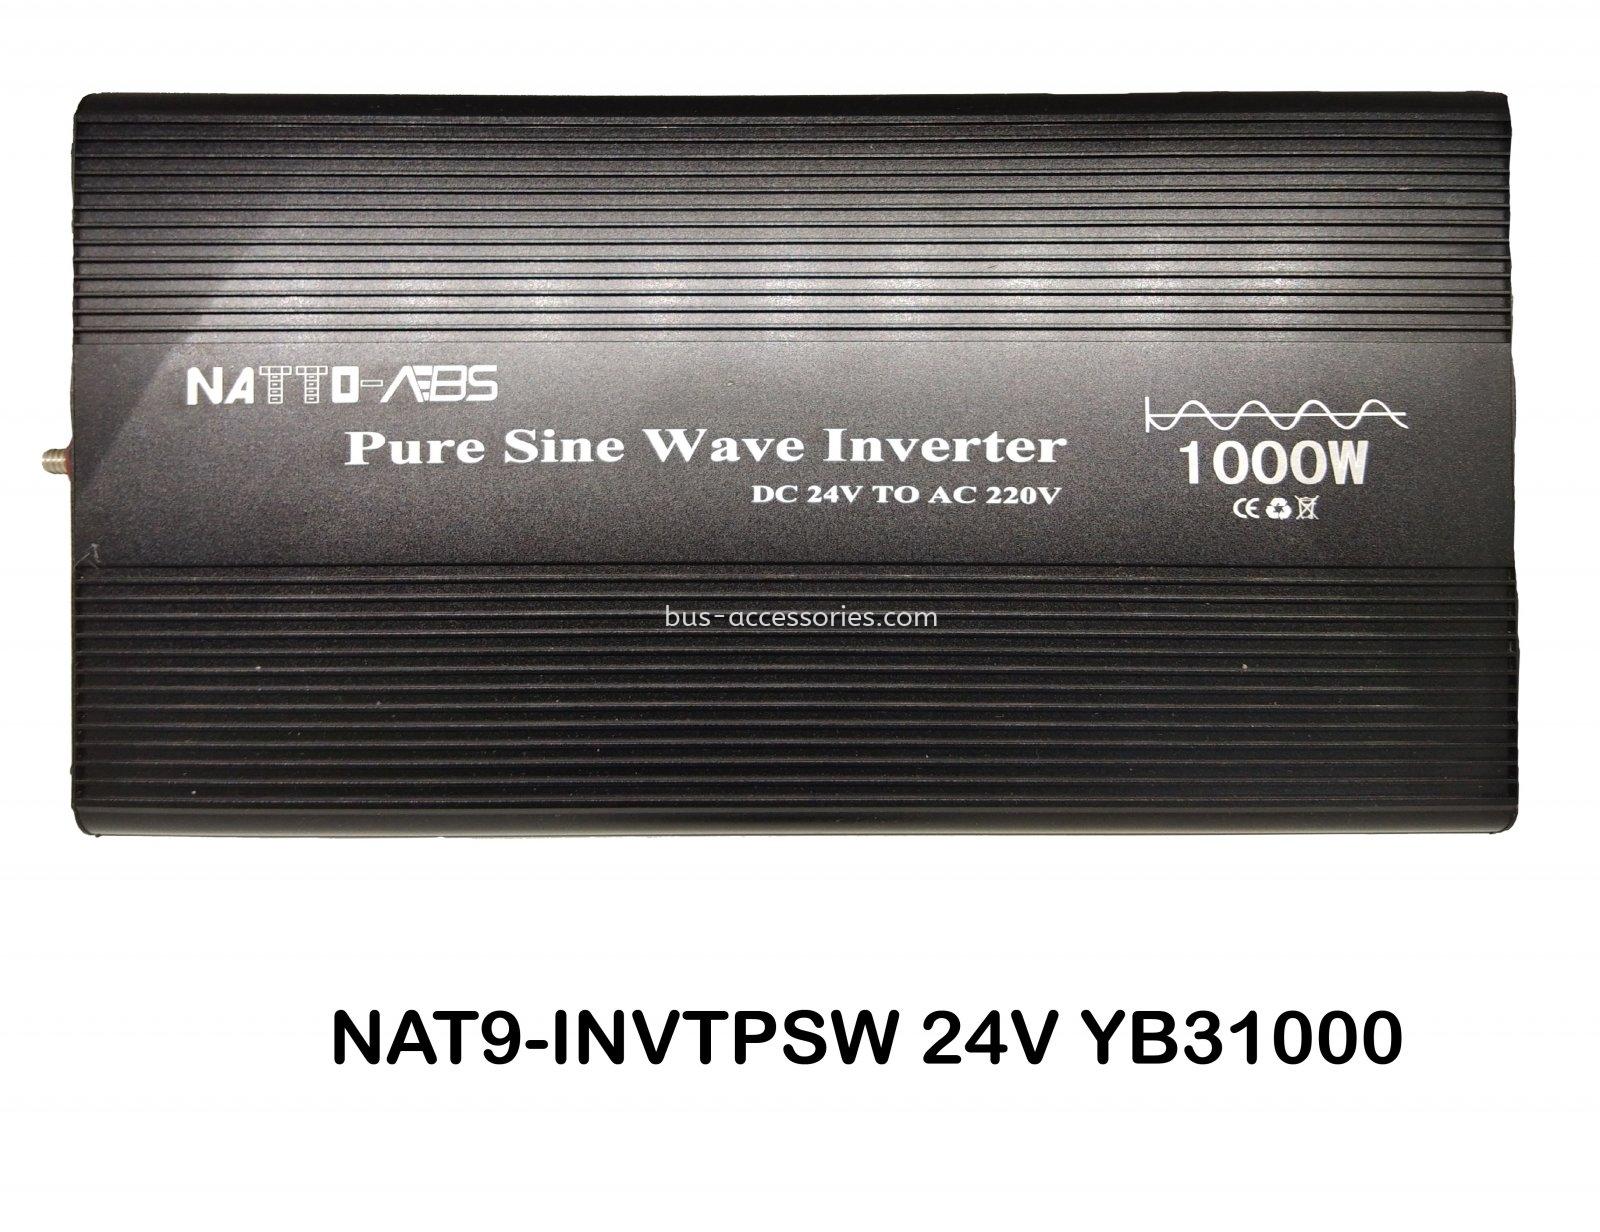 POWER INVERTER PURE SINE WAVE 24V 1000W